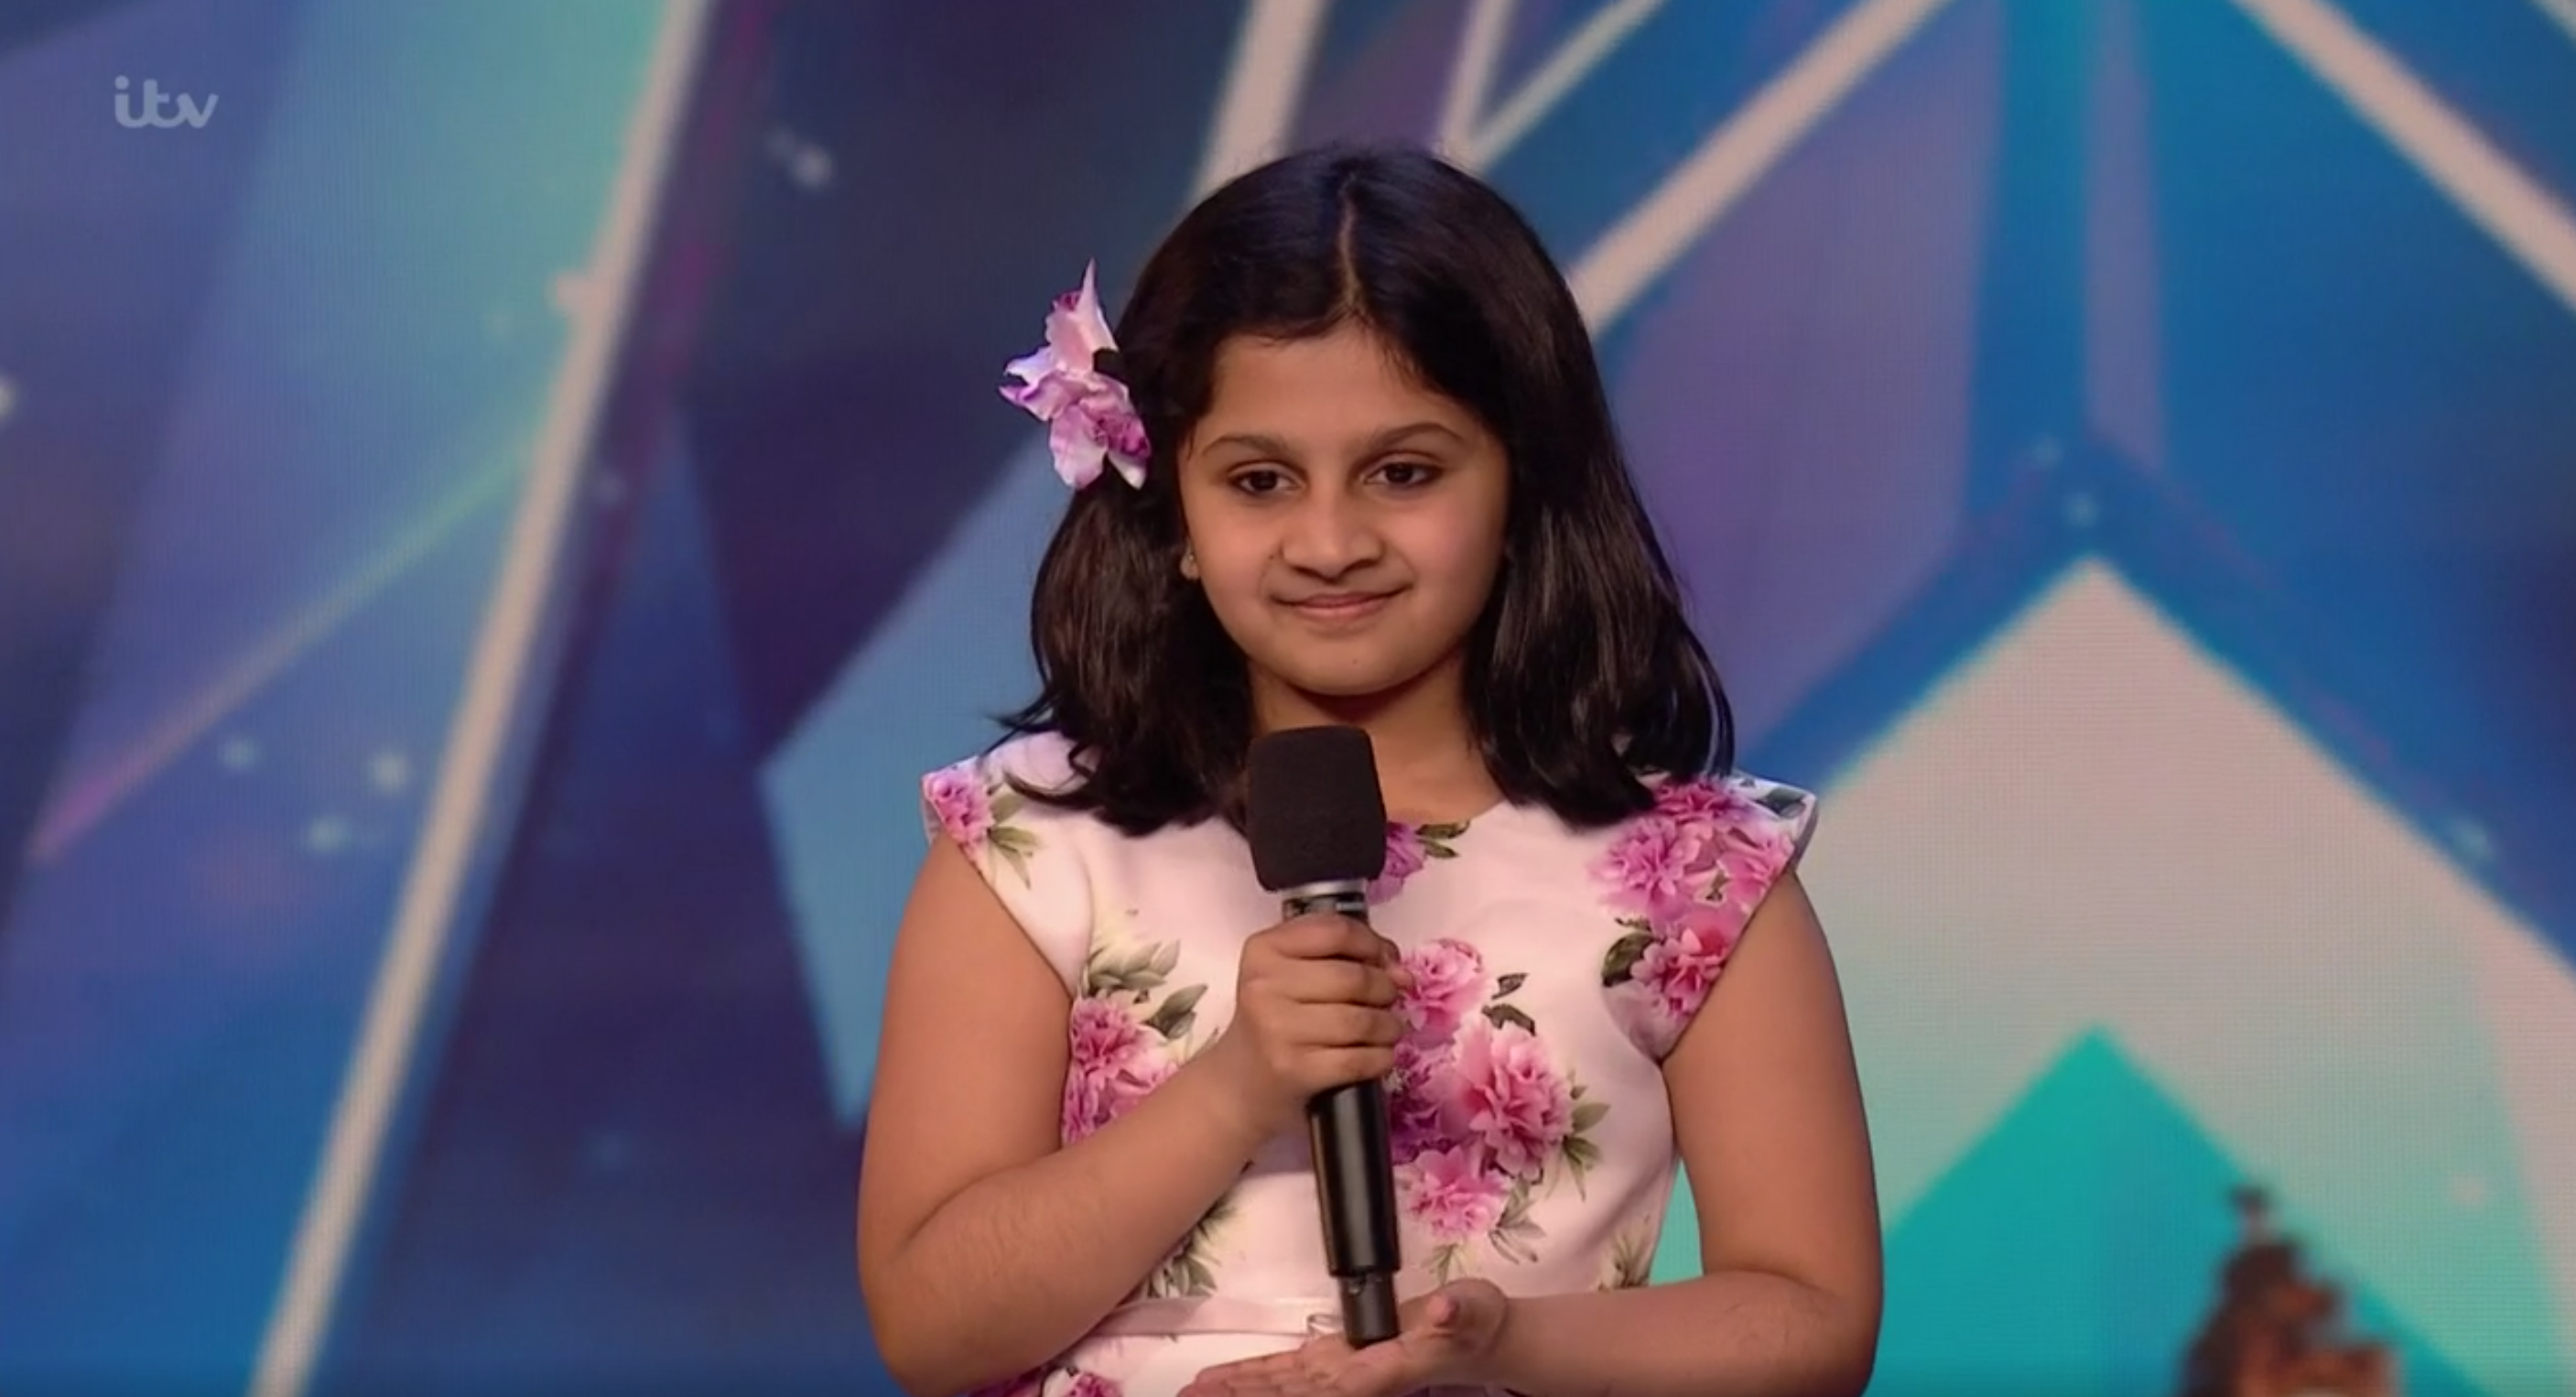 BGT child singer Souparnika Nair performed on Michael McIntyre's Big Show